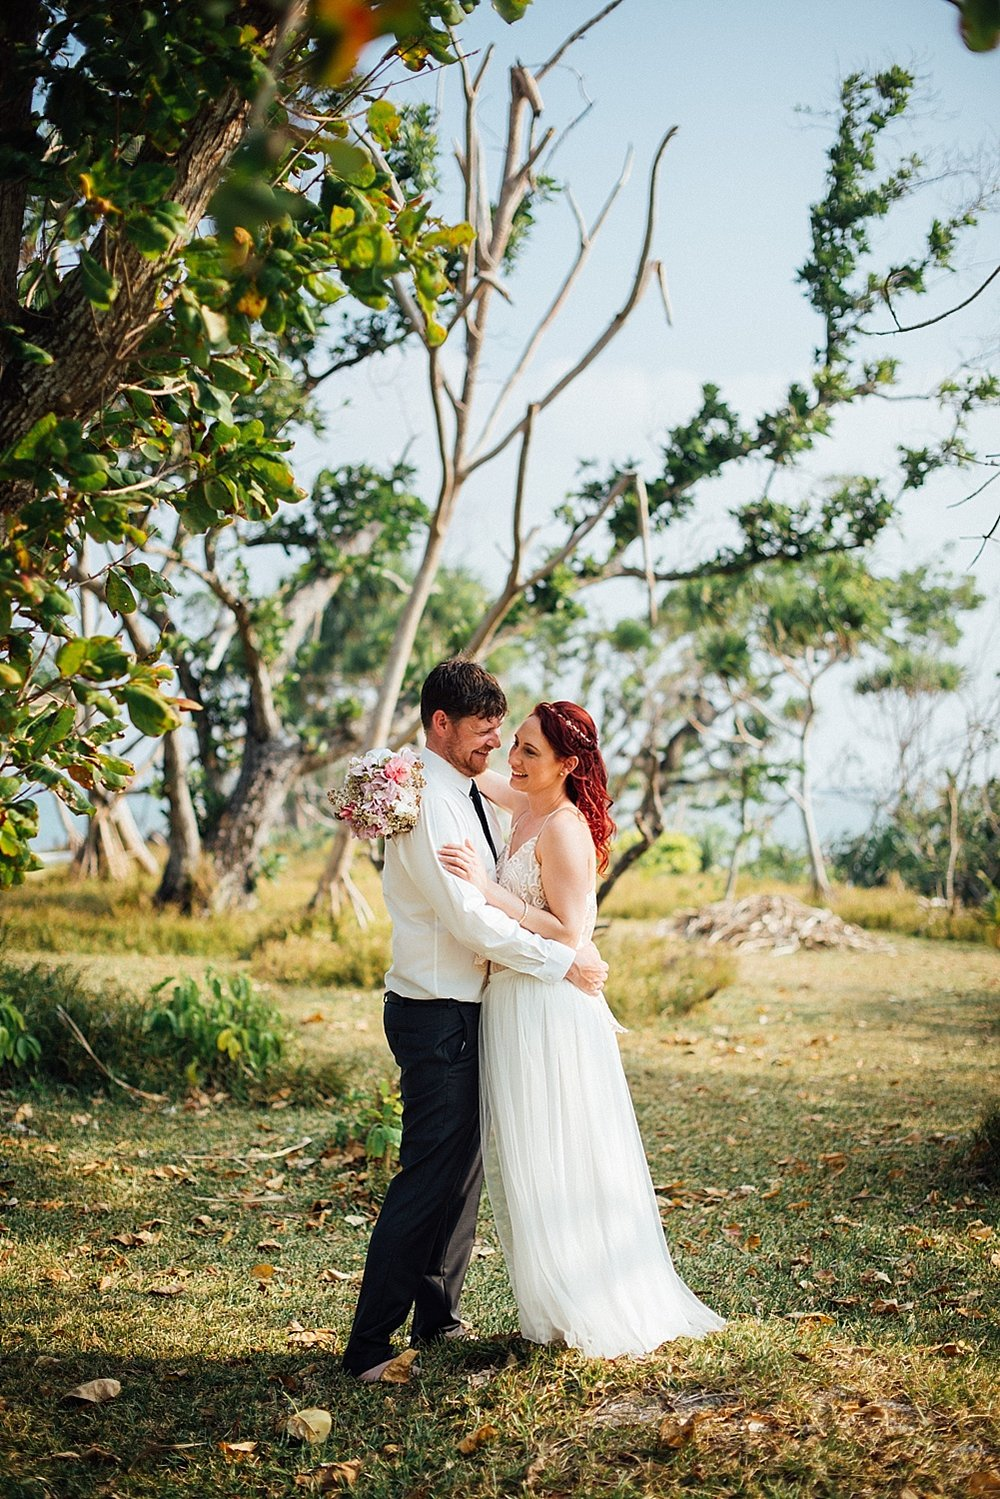 Kym&Lee-Wedding-Photography-Vanuatu-Eratap_0041.jpg